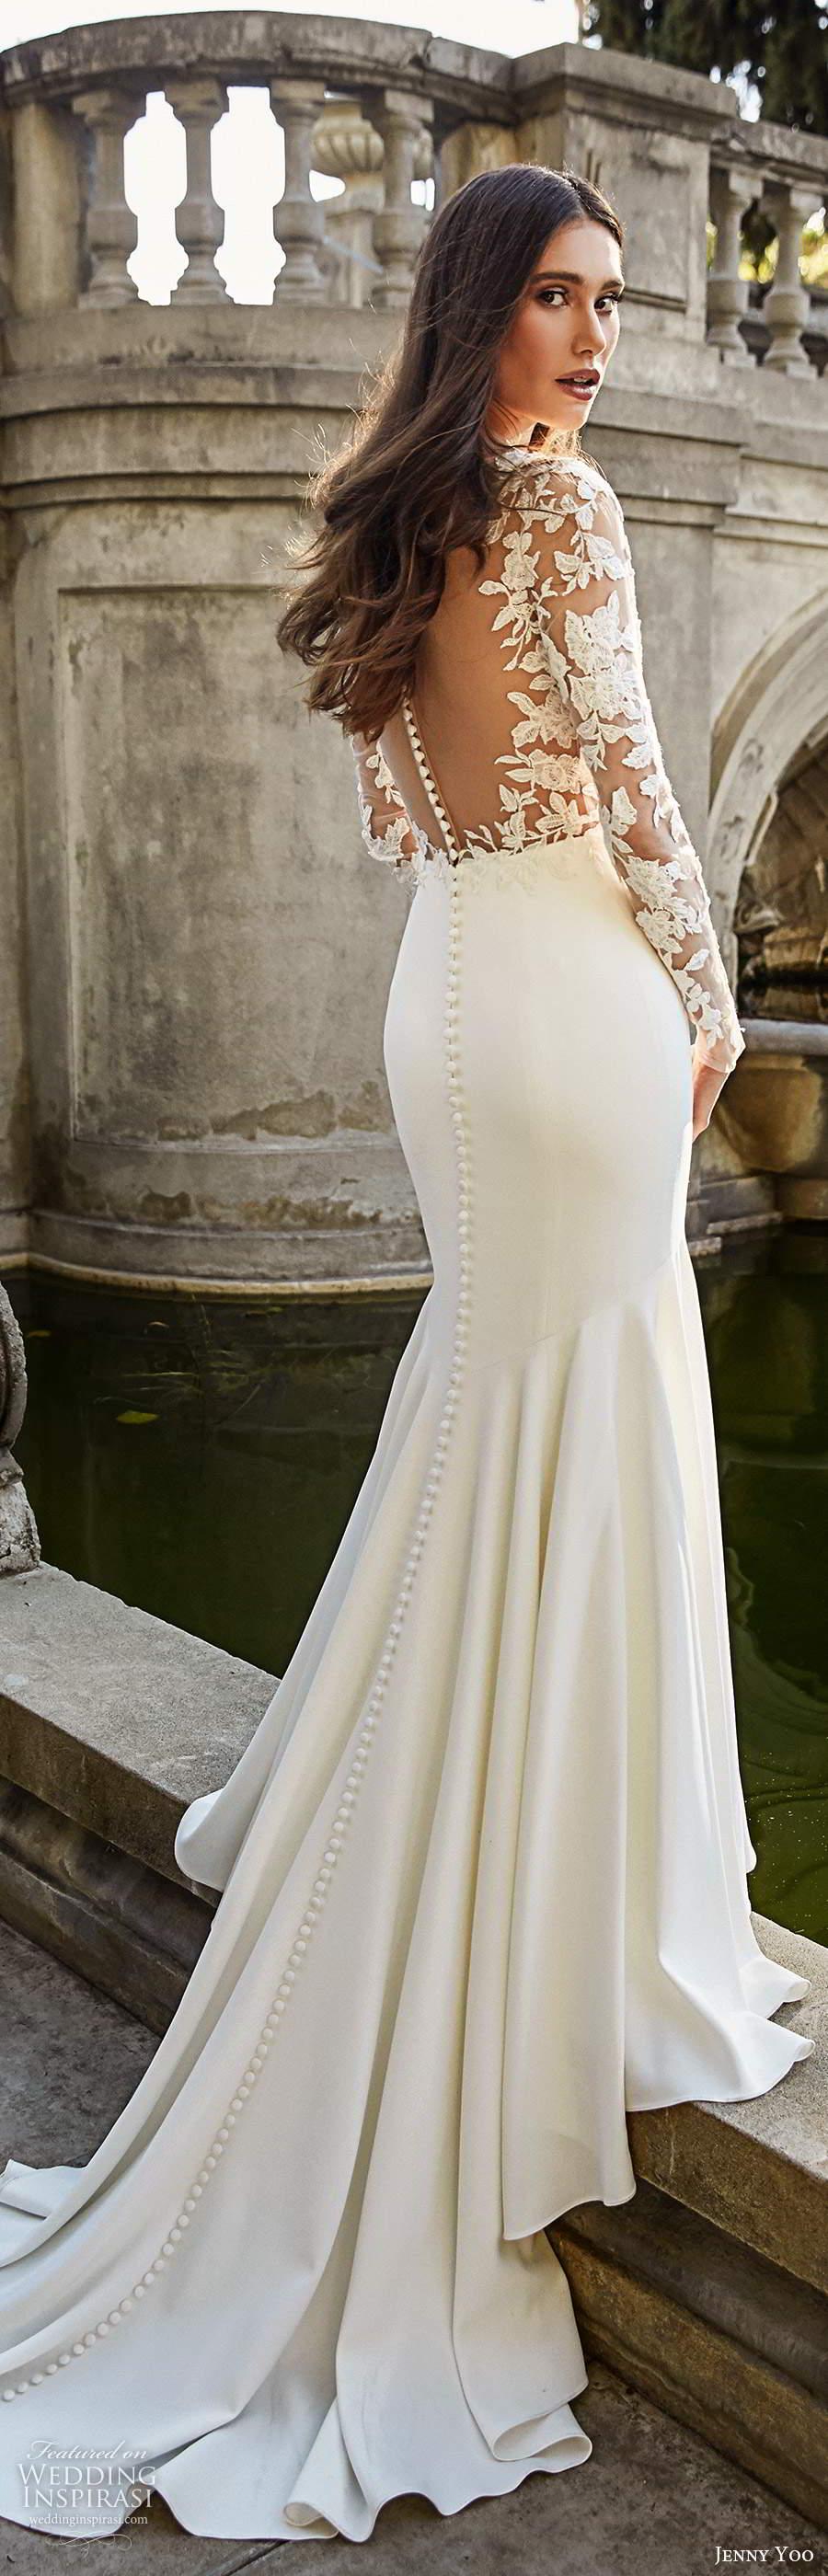 jenny yoo spring 2020 bridal illusion long sleeves plunging v neckline sheer embellished bodice clean skirt fit flare mermaid wedding dress chapel train (8) lbv